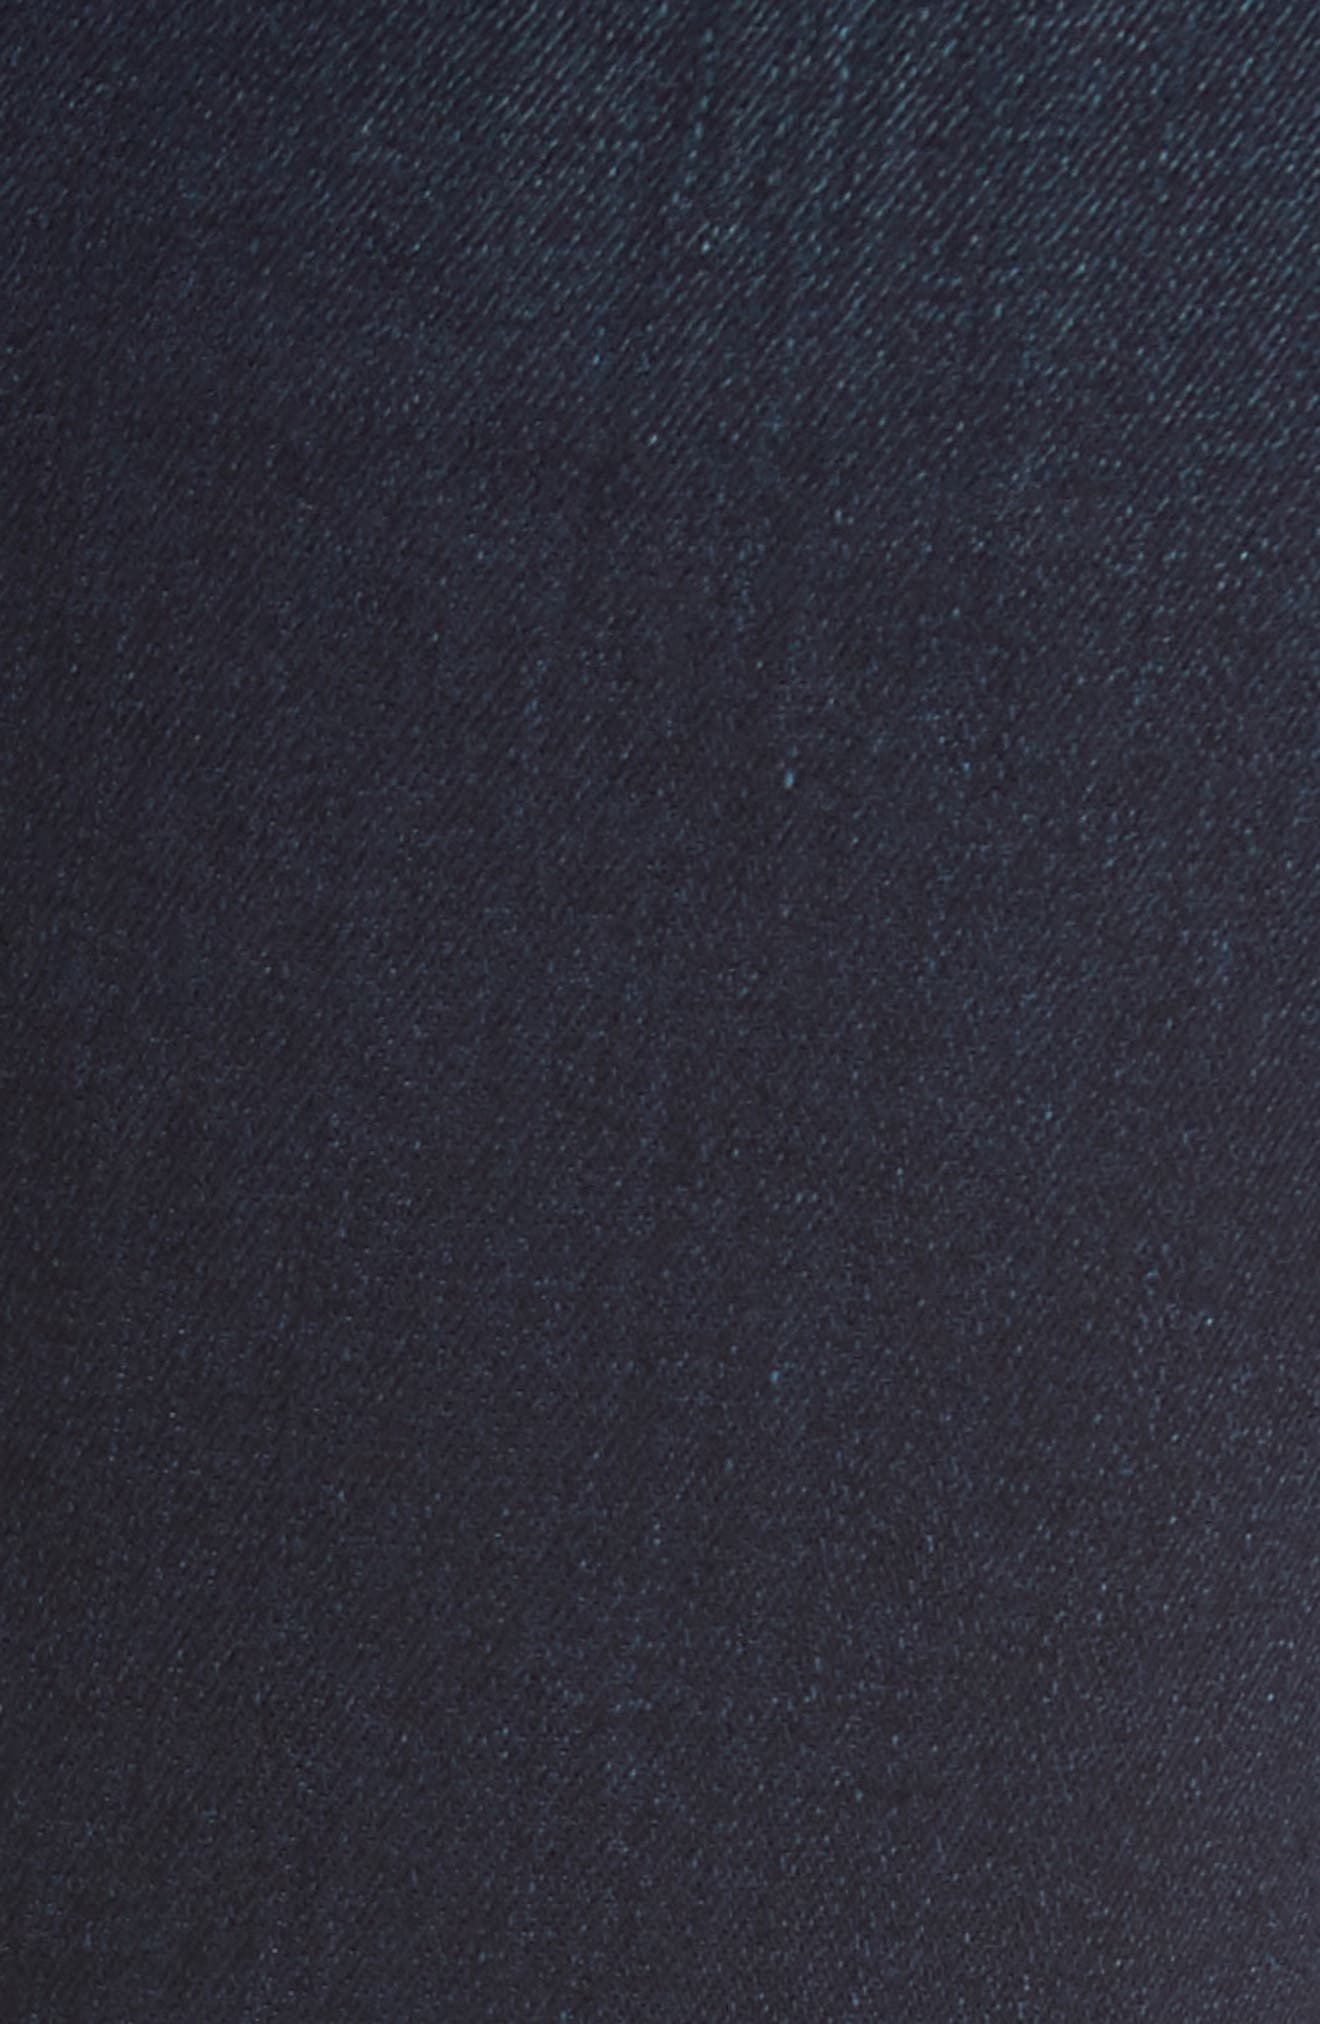 Newton Skinny Jeans,                             Alternate thumbnail 5, color,                             410